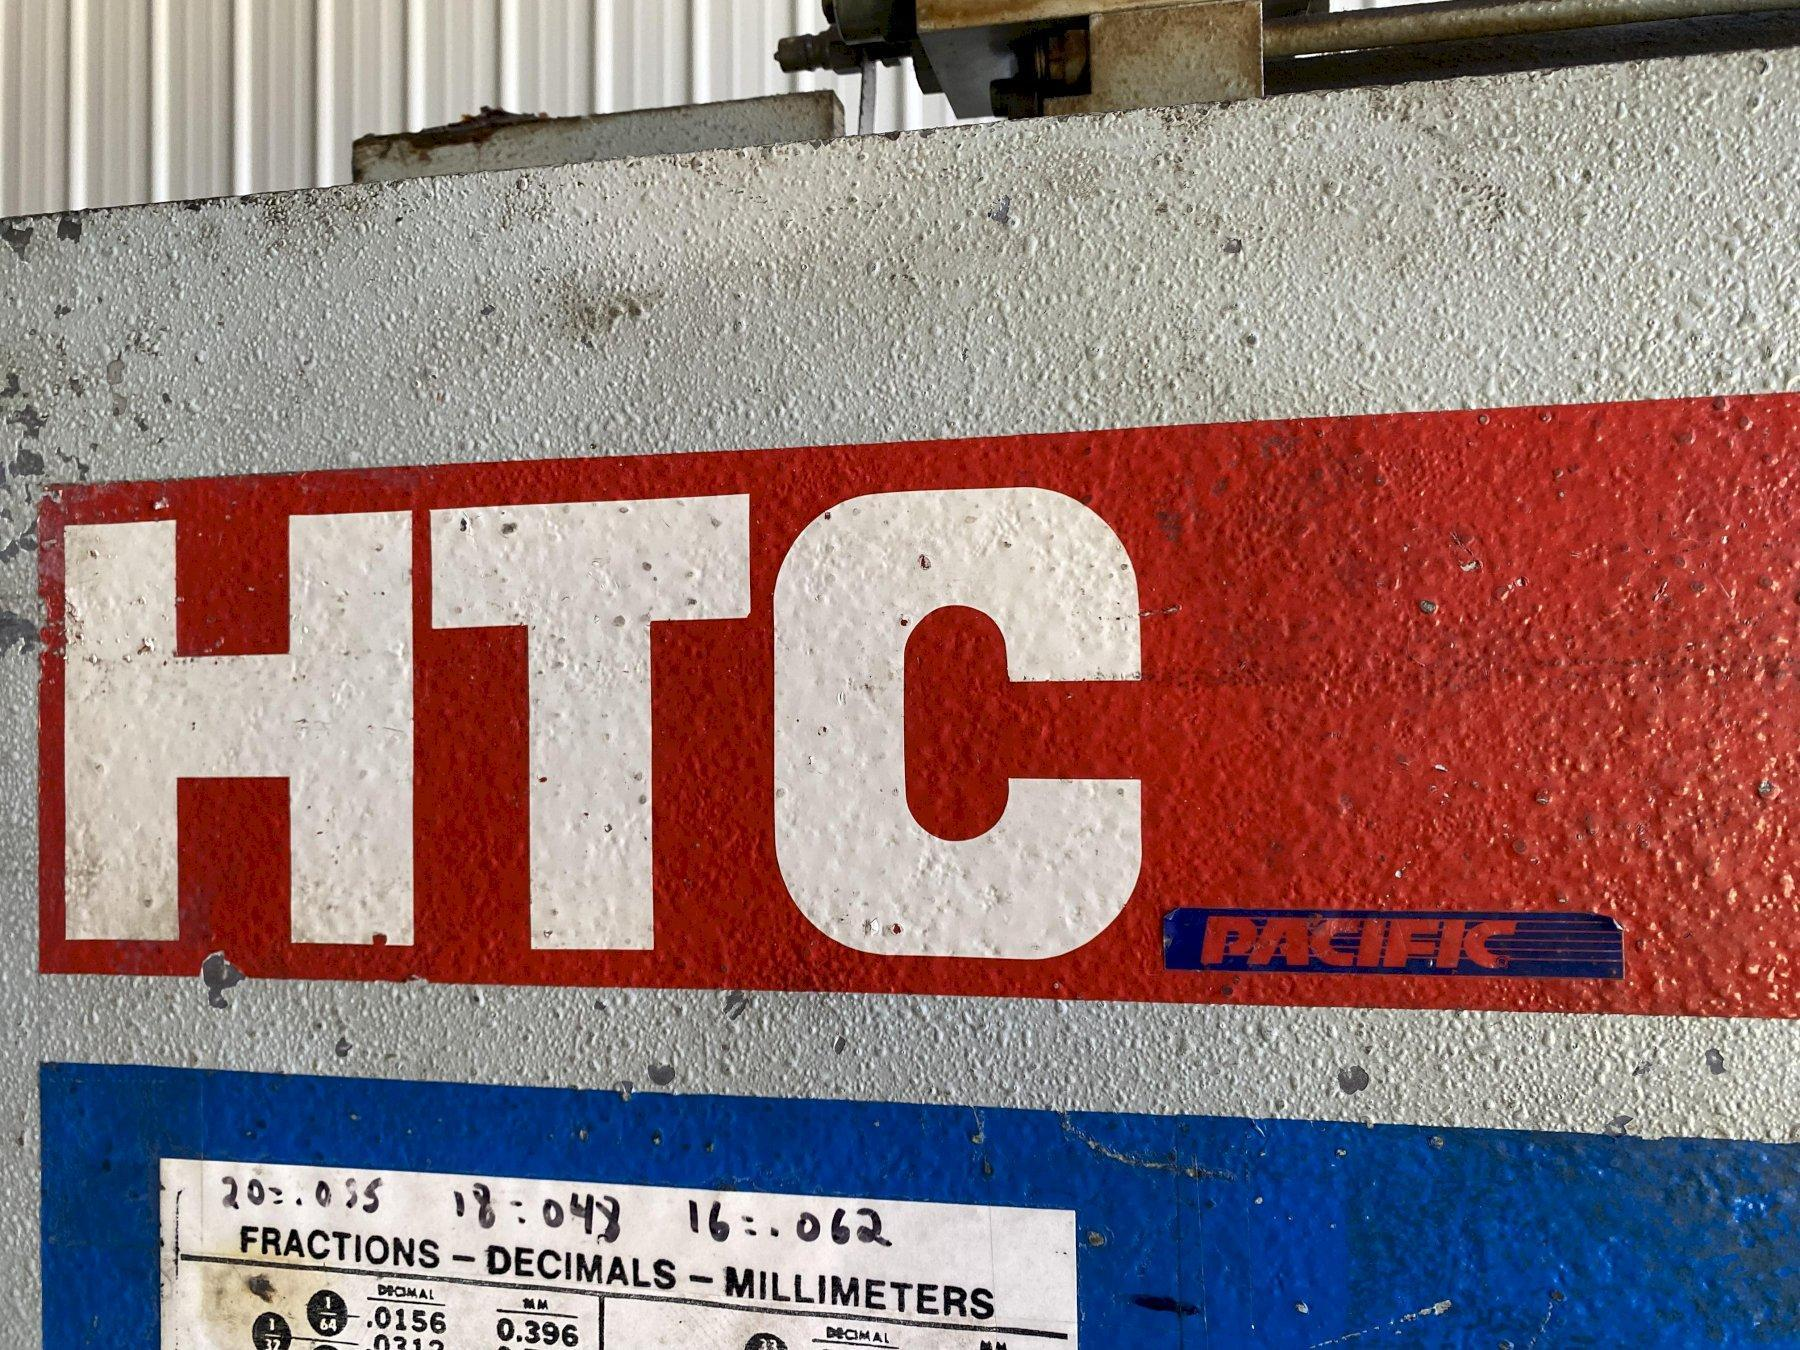 "10' X 1/4"" HTC HYDRA TOOL PACIFIC MODEL #250-10PS HYDRAULIC POWER SHEAR:STOCK 15519"